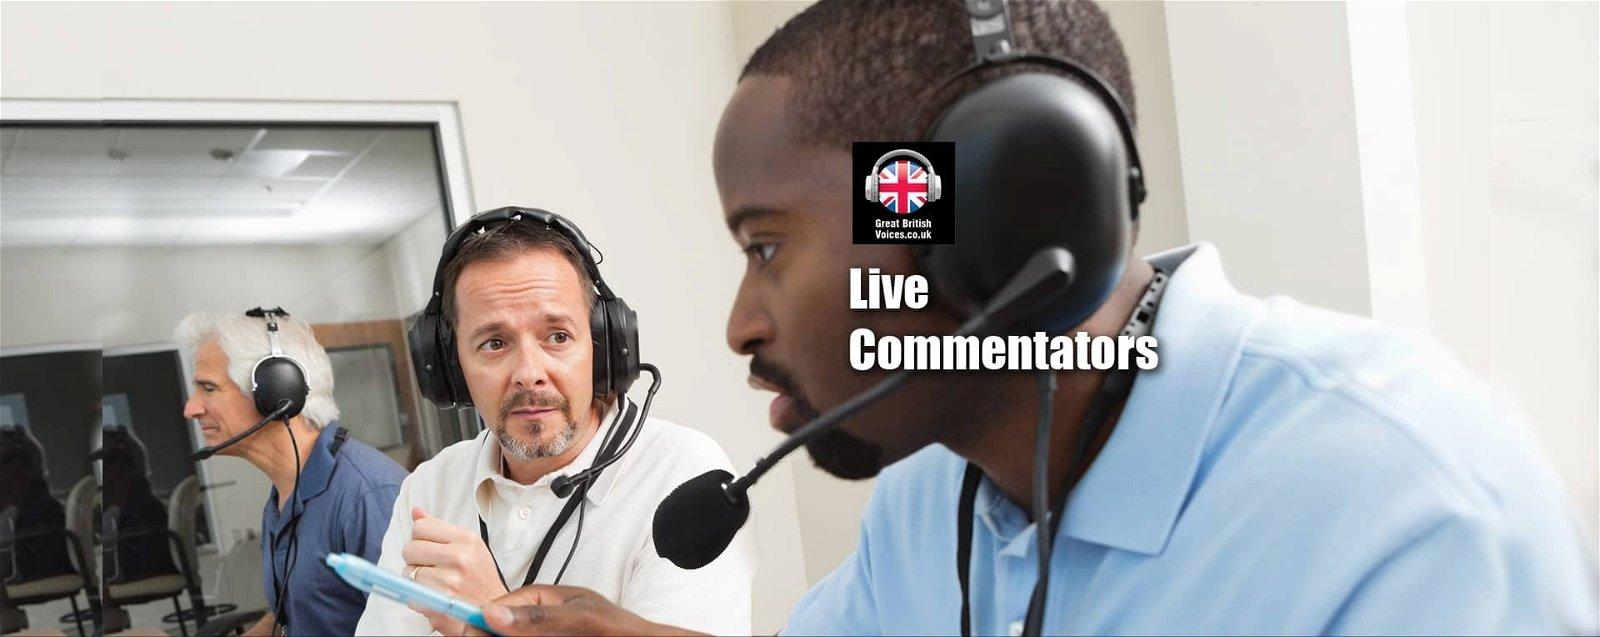 Live Commentators at Great British Voices-min